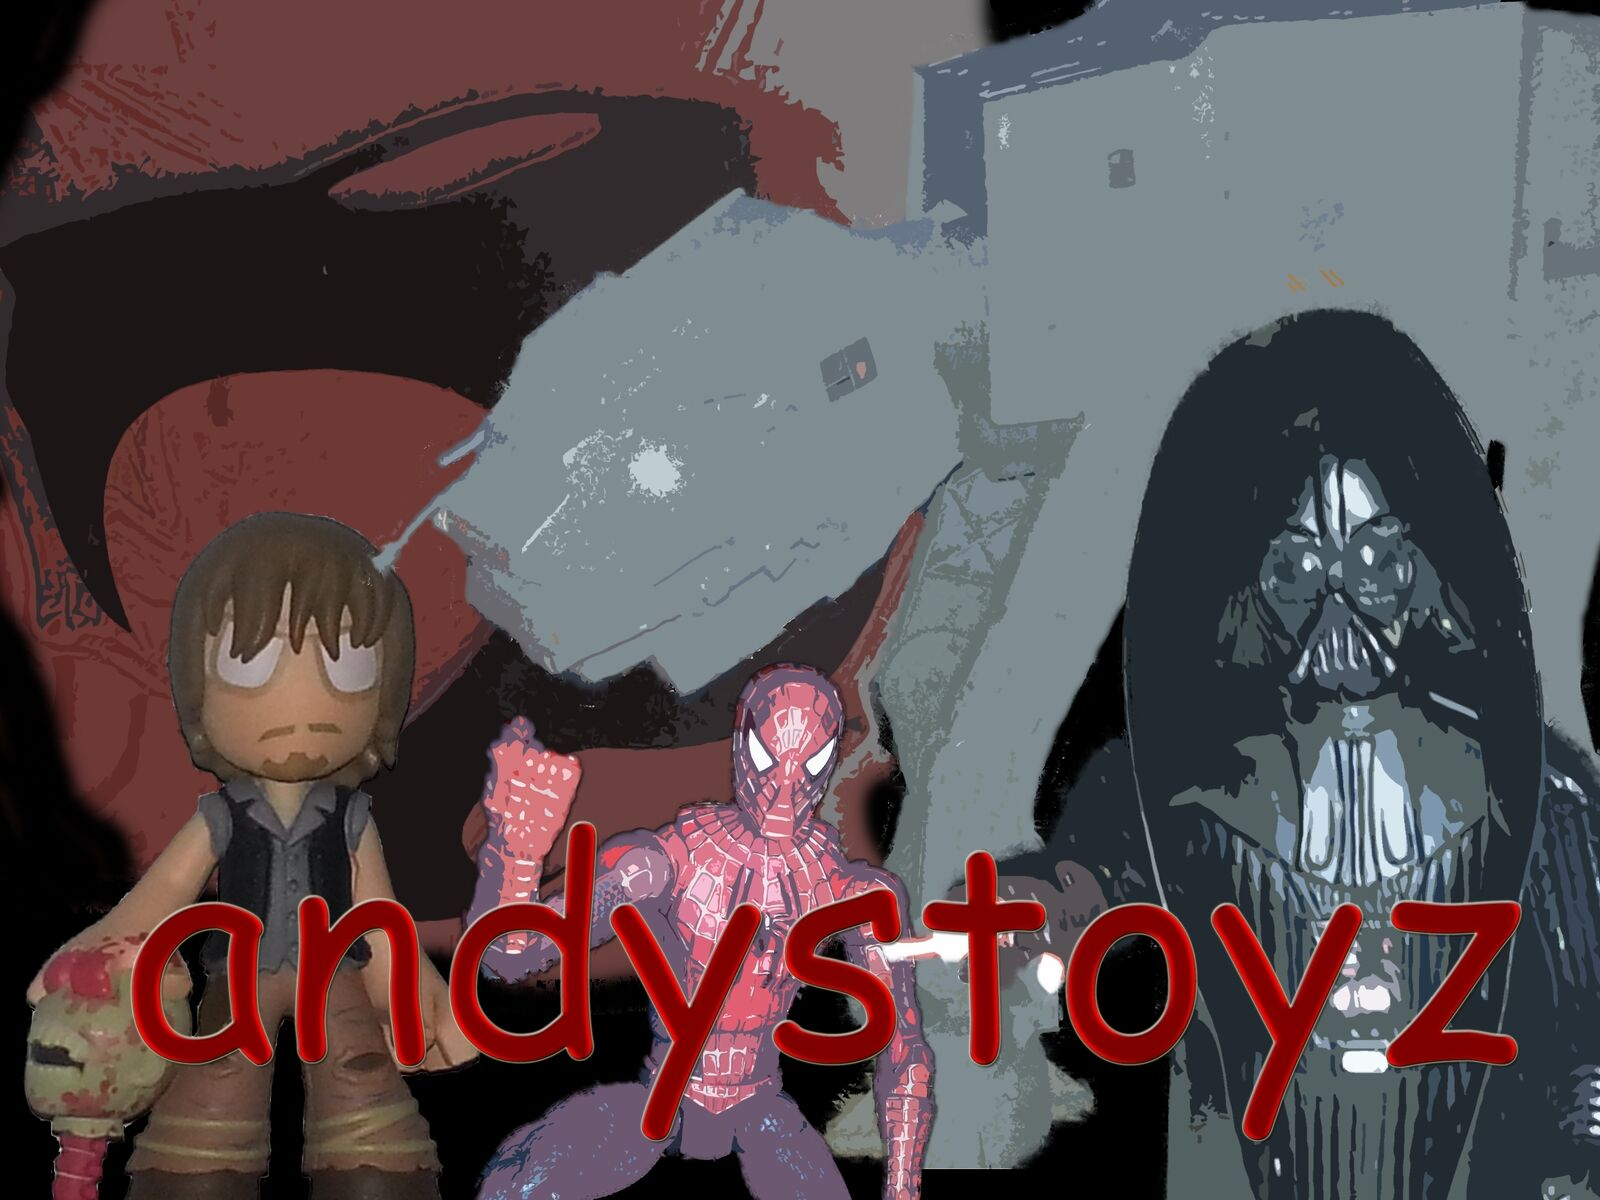 andystoyz